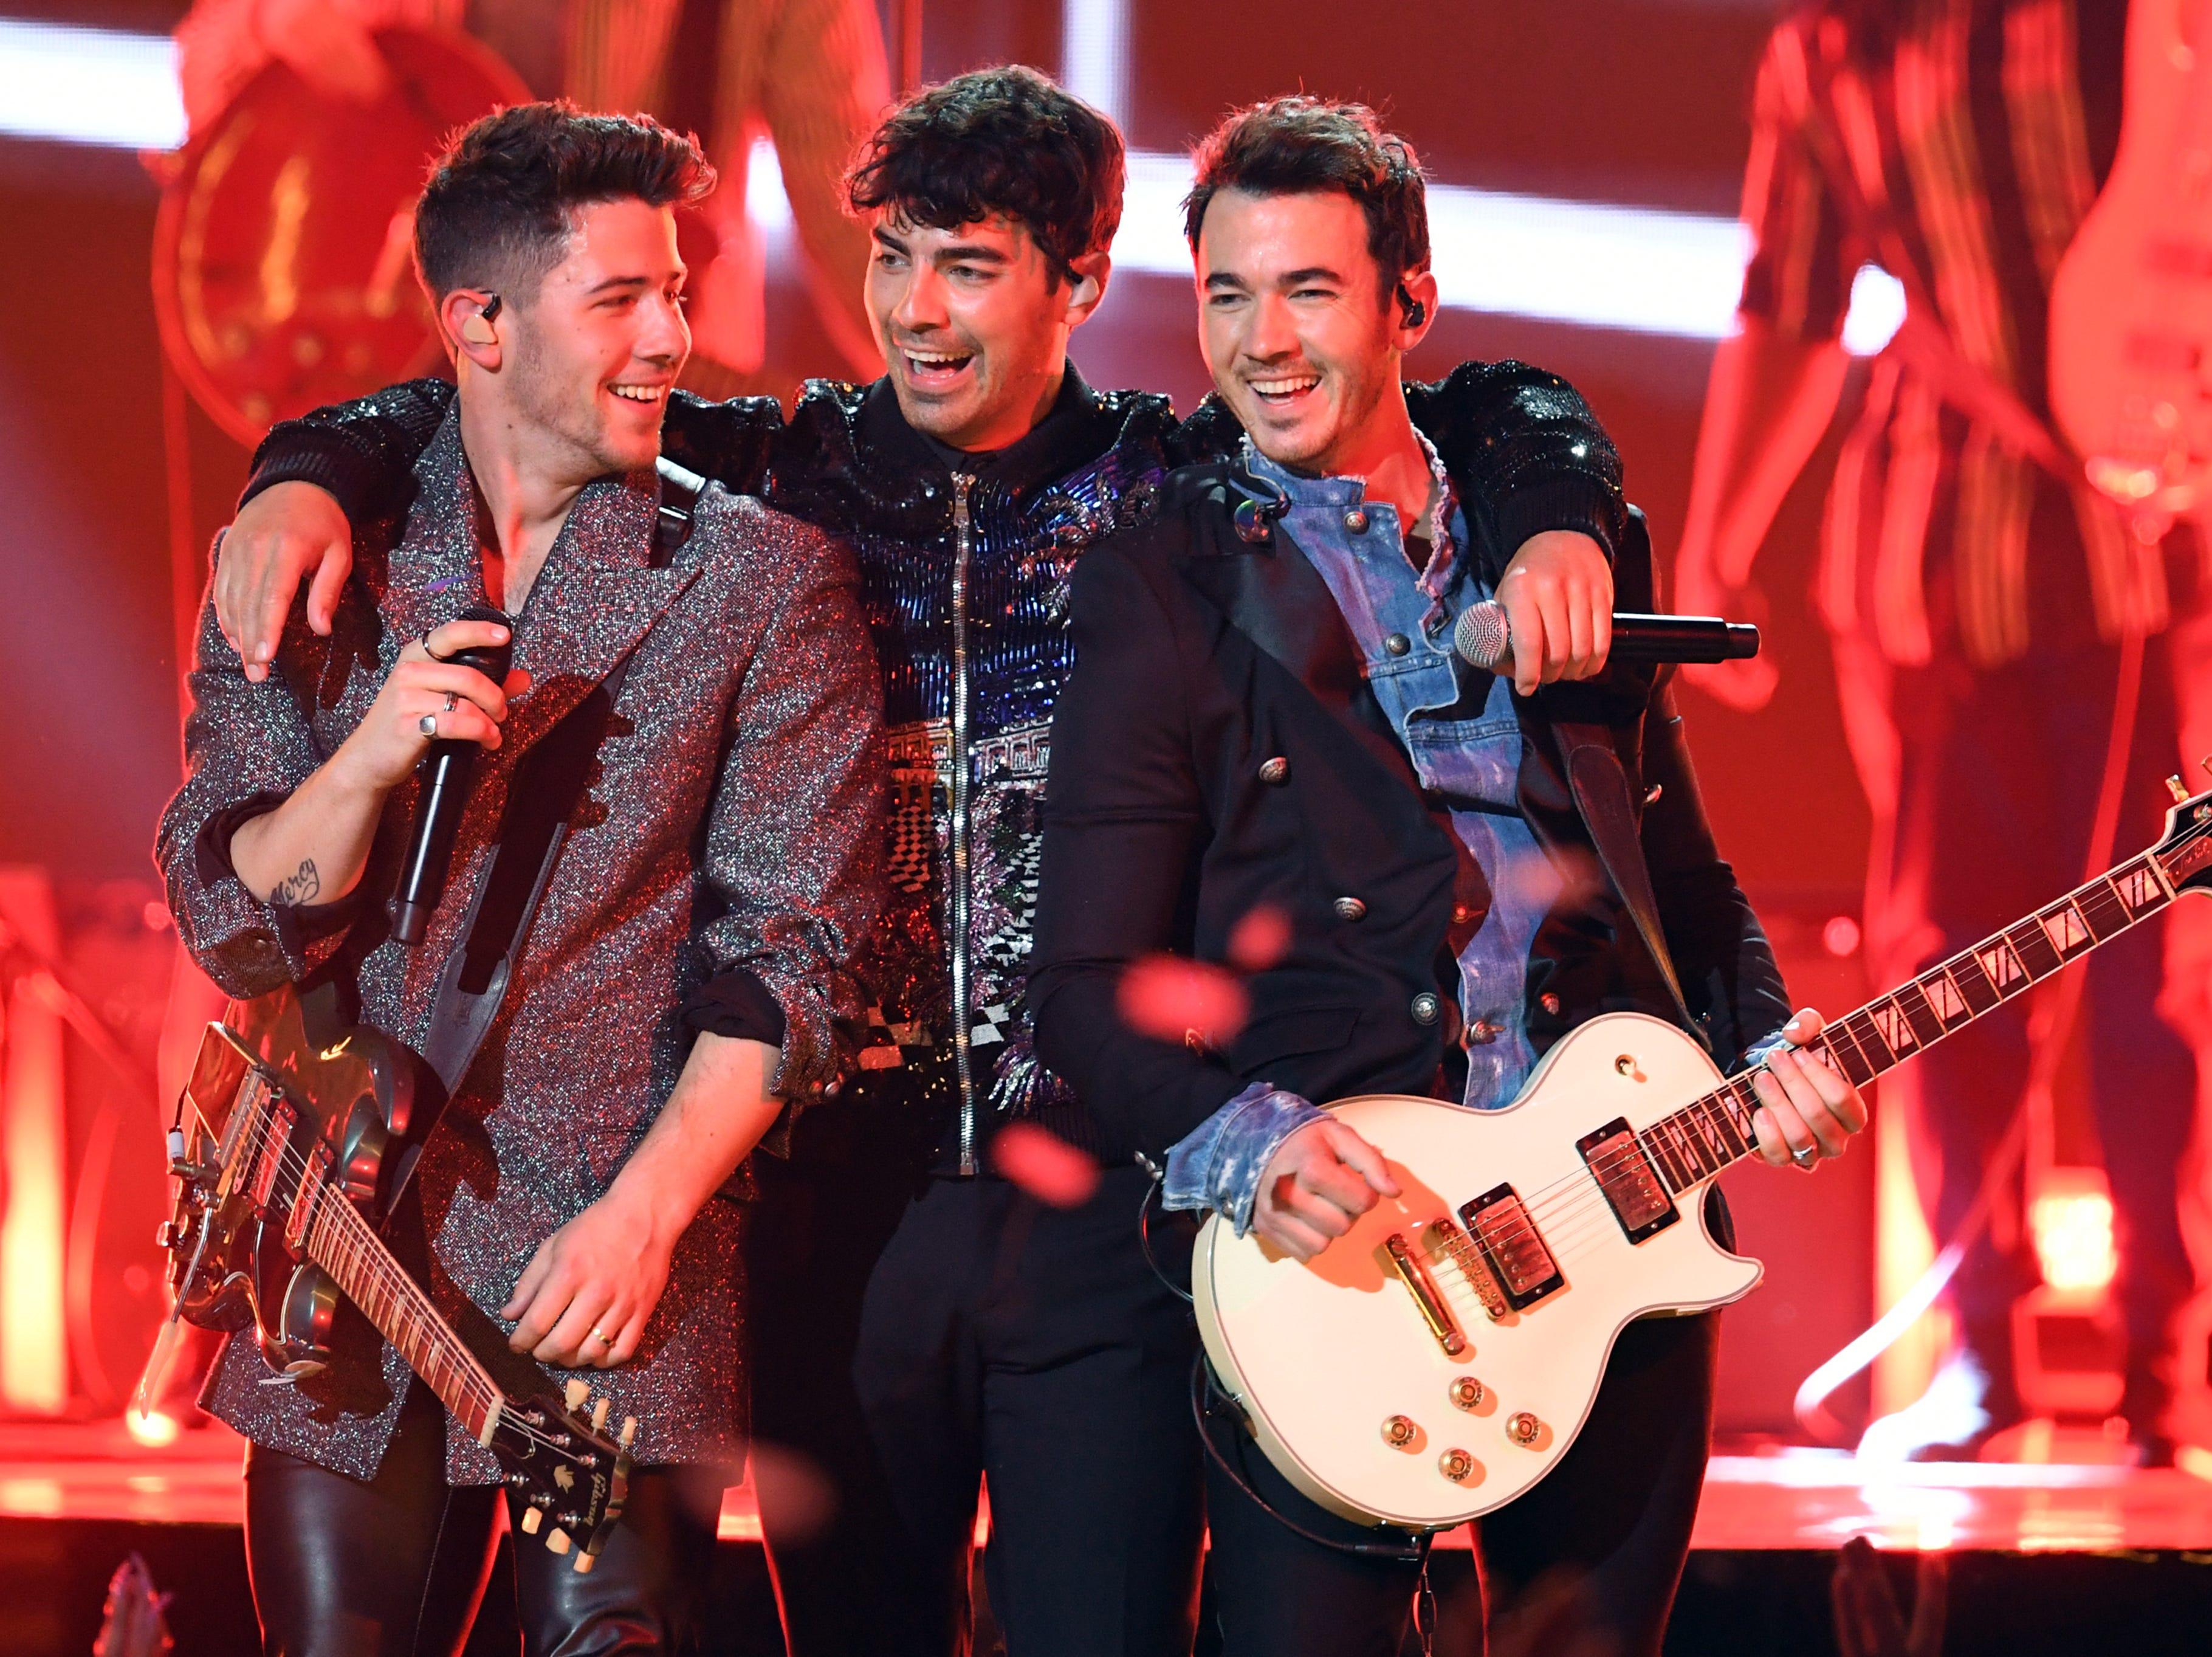 (L-R) Nick Jonas, Joe Jonas, and Kevin Jonas of Jonas Brothers perform onstage during the 2019 Billboard Music Awards at MGM Grand Garden Arena on May 01, 2019 in Las Vegas, Nevada.